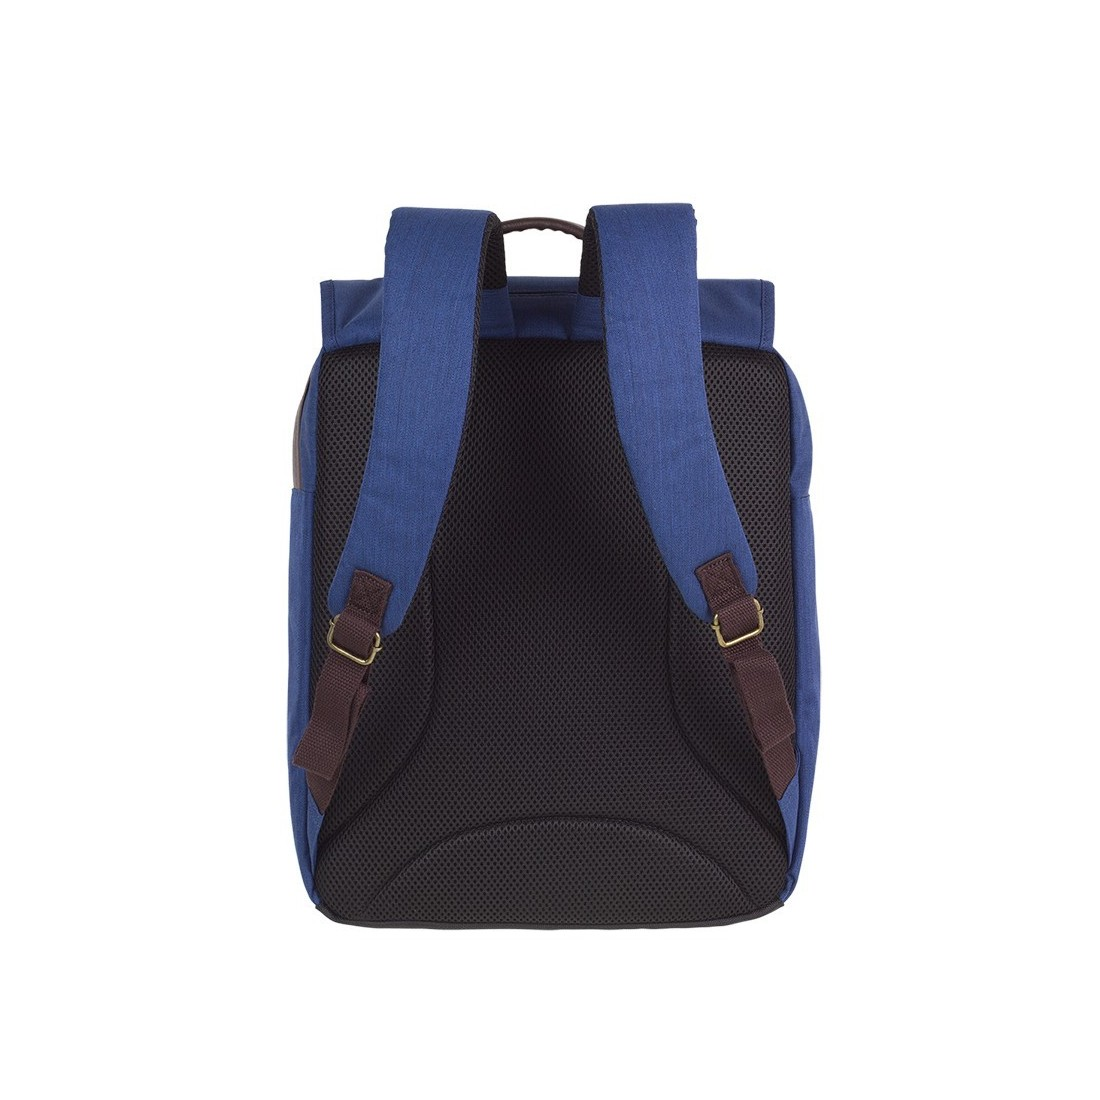 554091ef72009 Plecak kostka - wojskowy plecak z naszywkami - plecak-tornister.pl